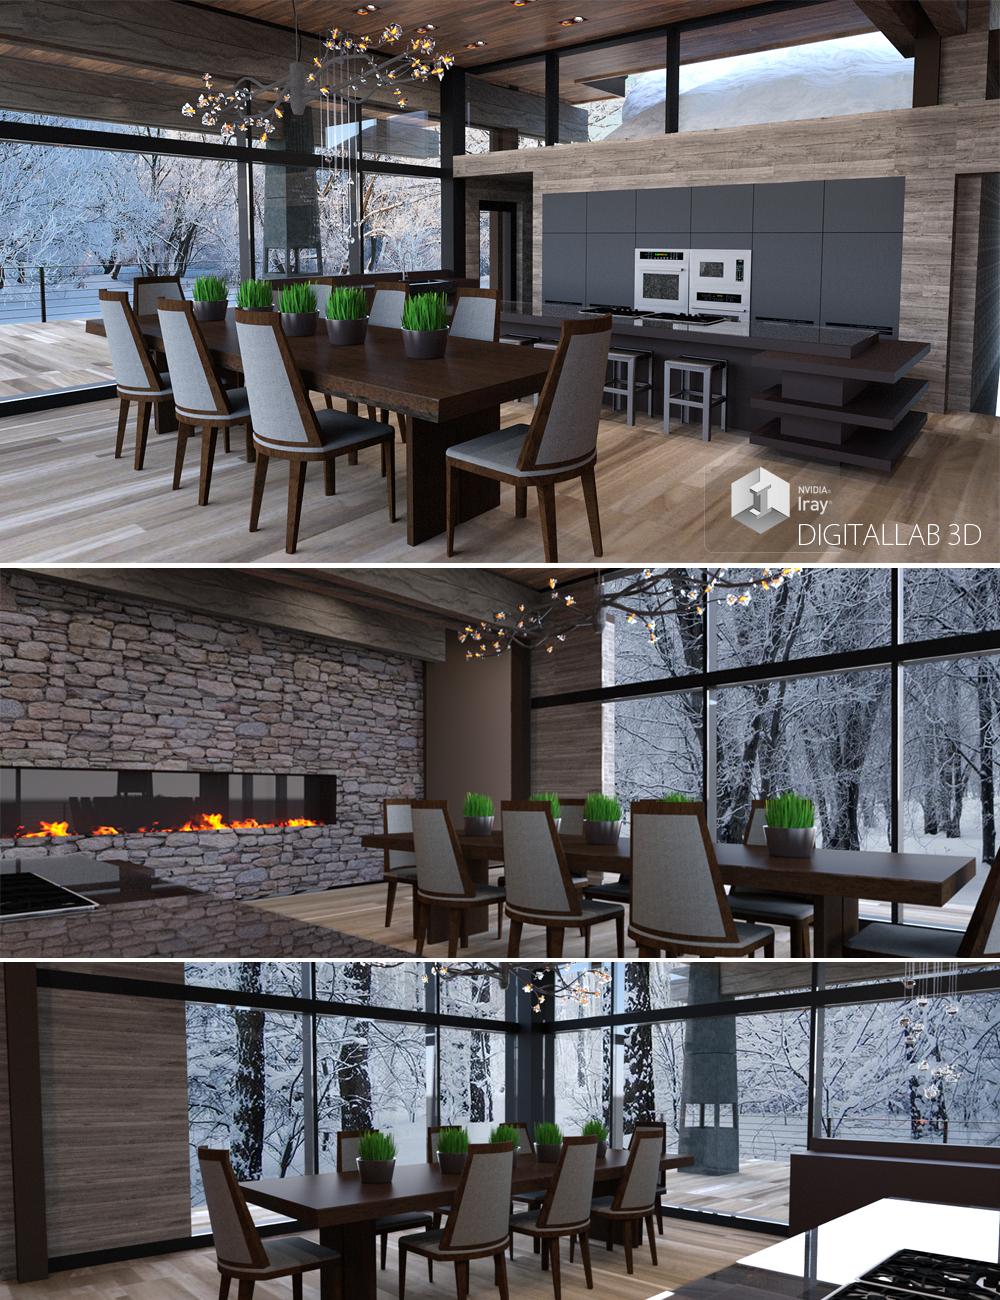 Mountain Estate by: Digitallab3D, 3D Models by Daz 3D